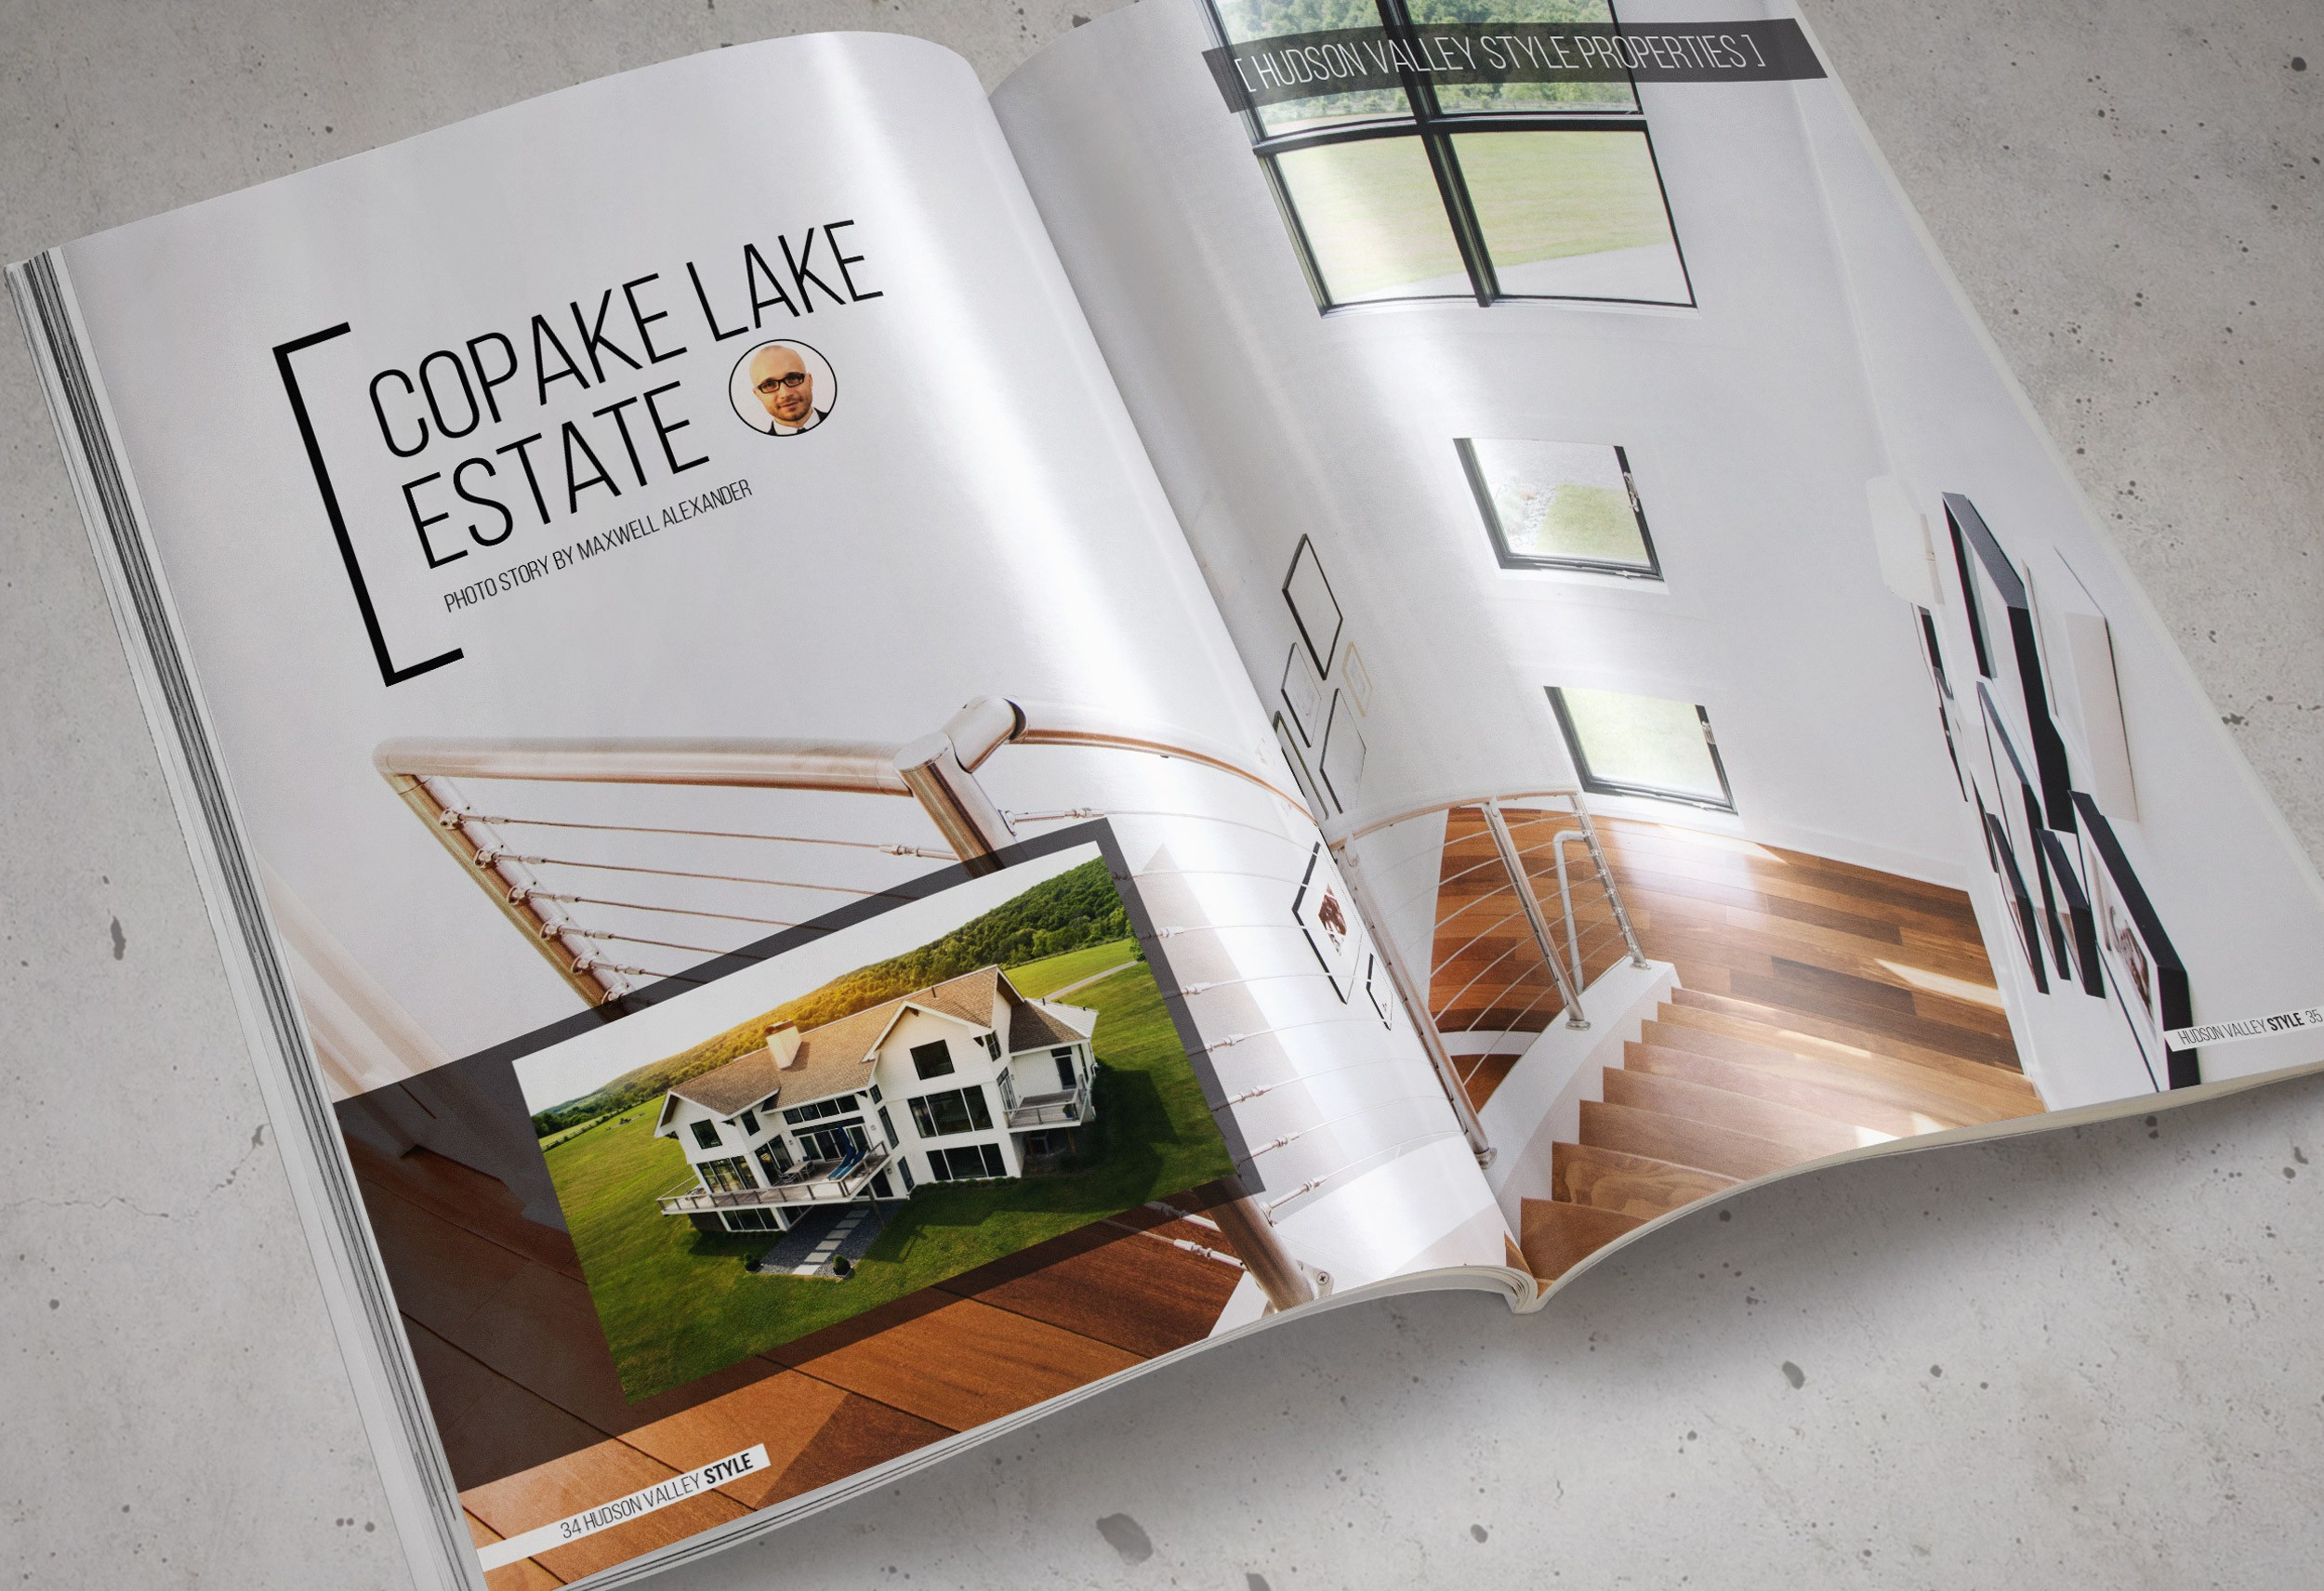 Copake Lake Estate - Hudson Valley Style Magazine - Photo Essay by Maxwell Alexander